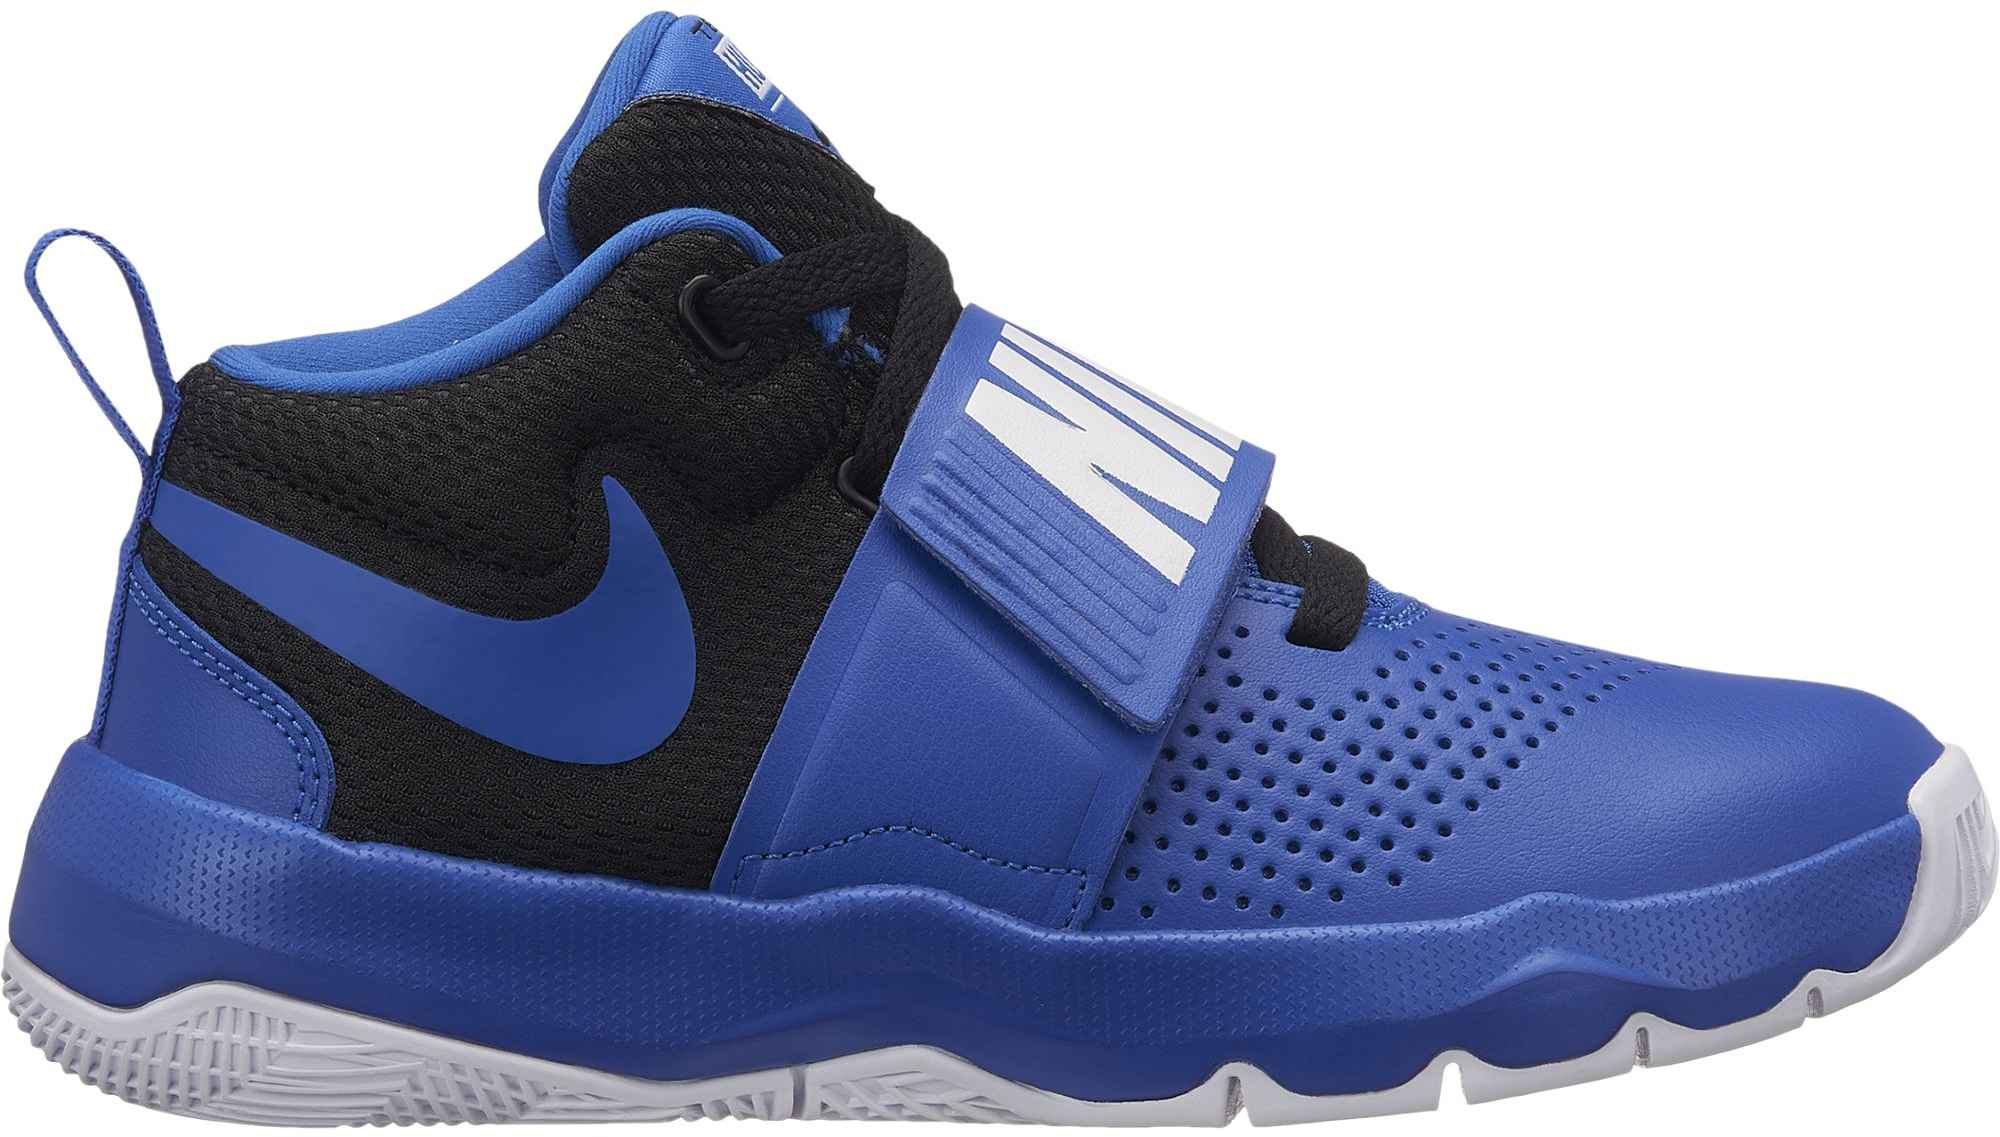 774af2ae06de9 Nike Team Hustle dětská basketbalová obuv modrá/černá | Sport ...